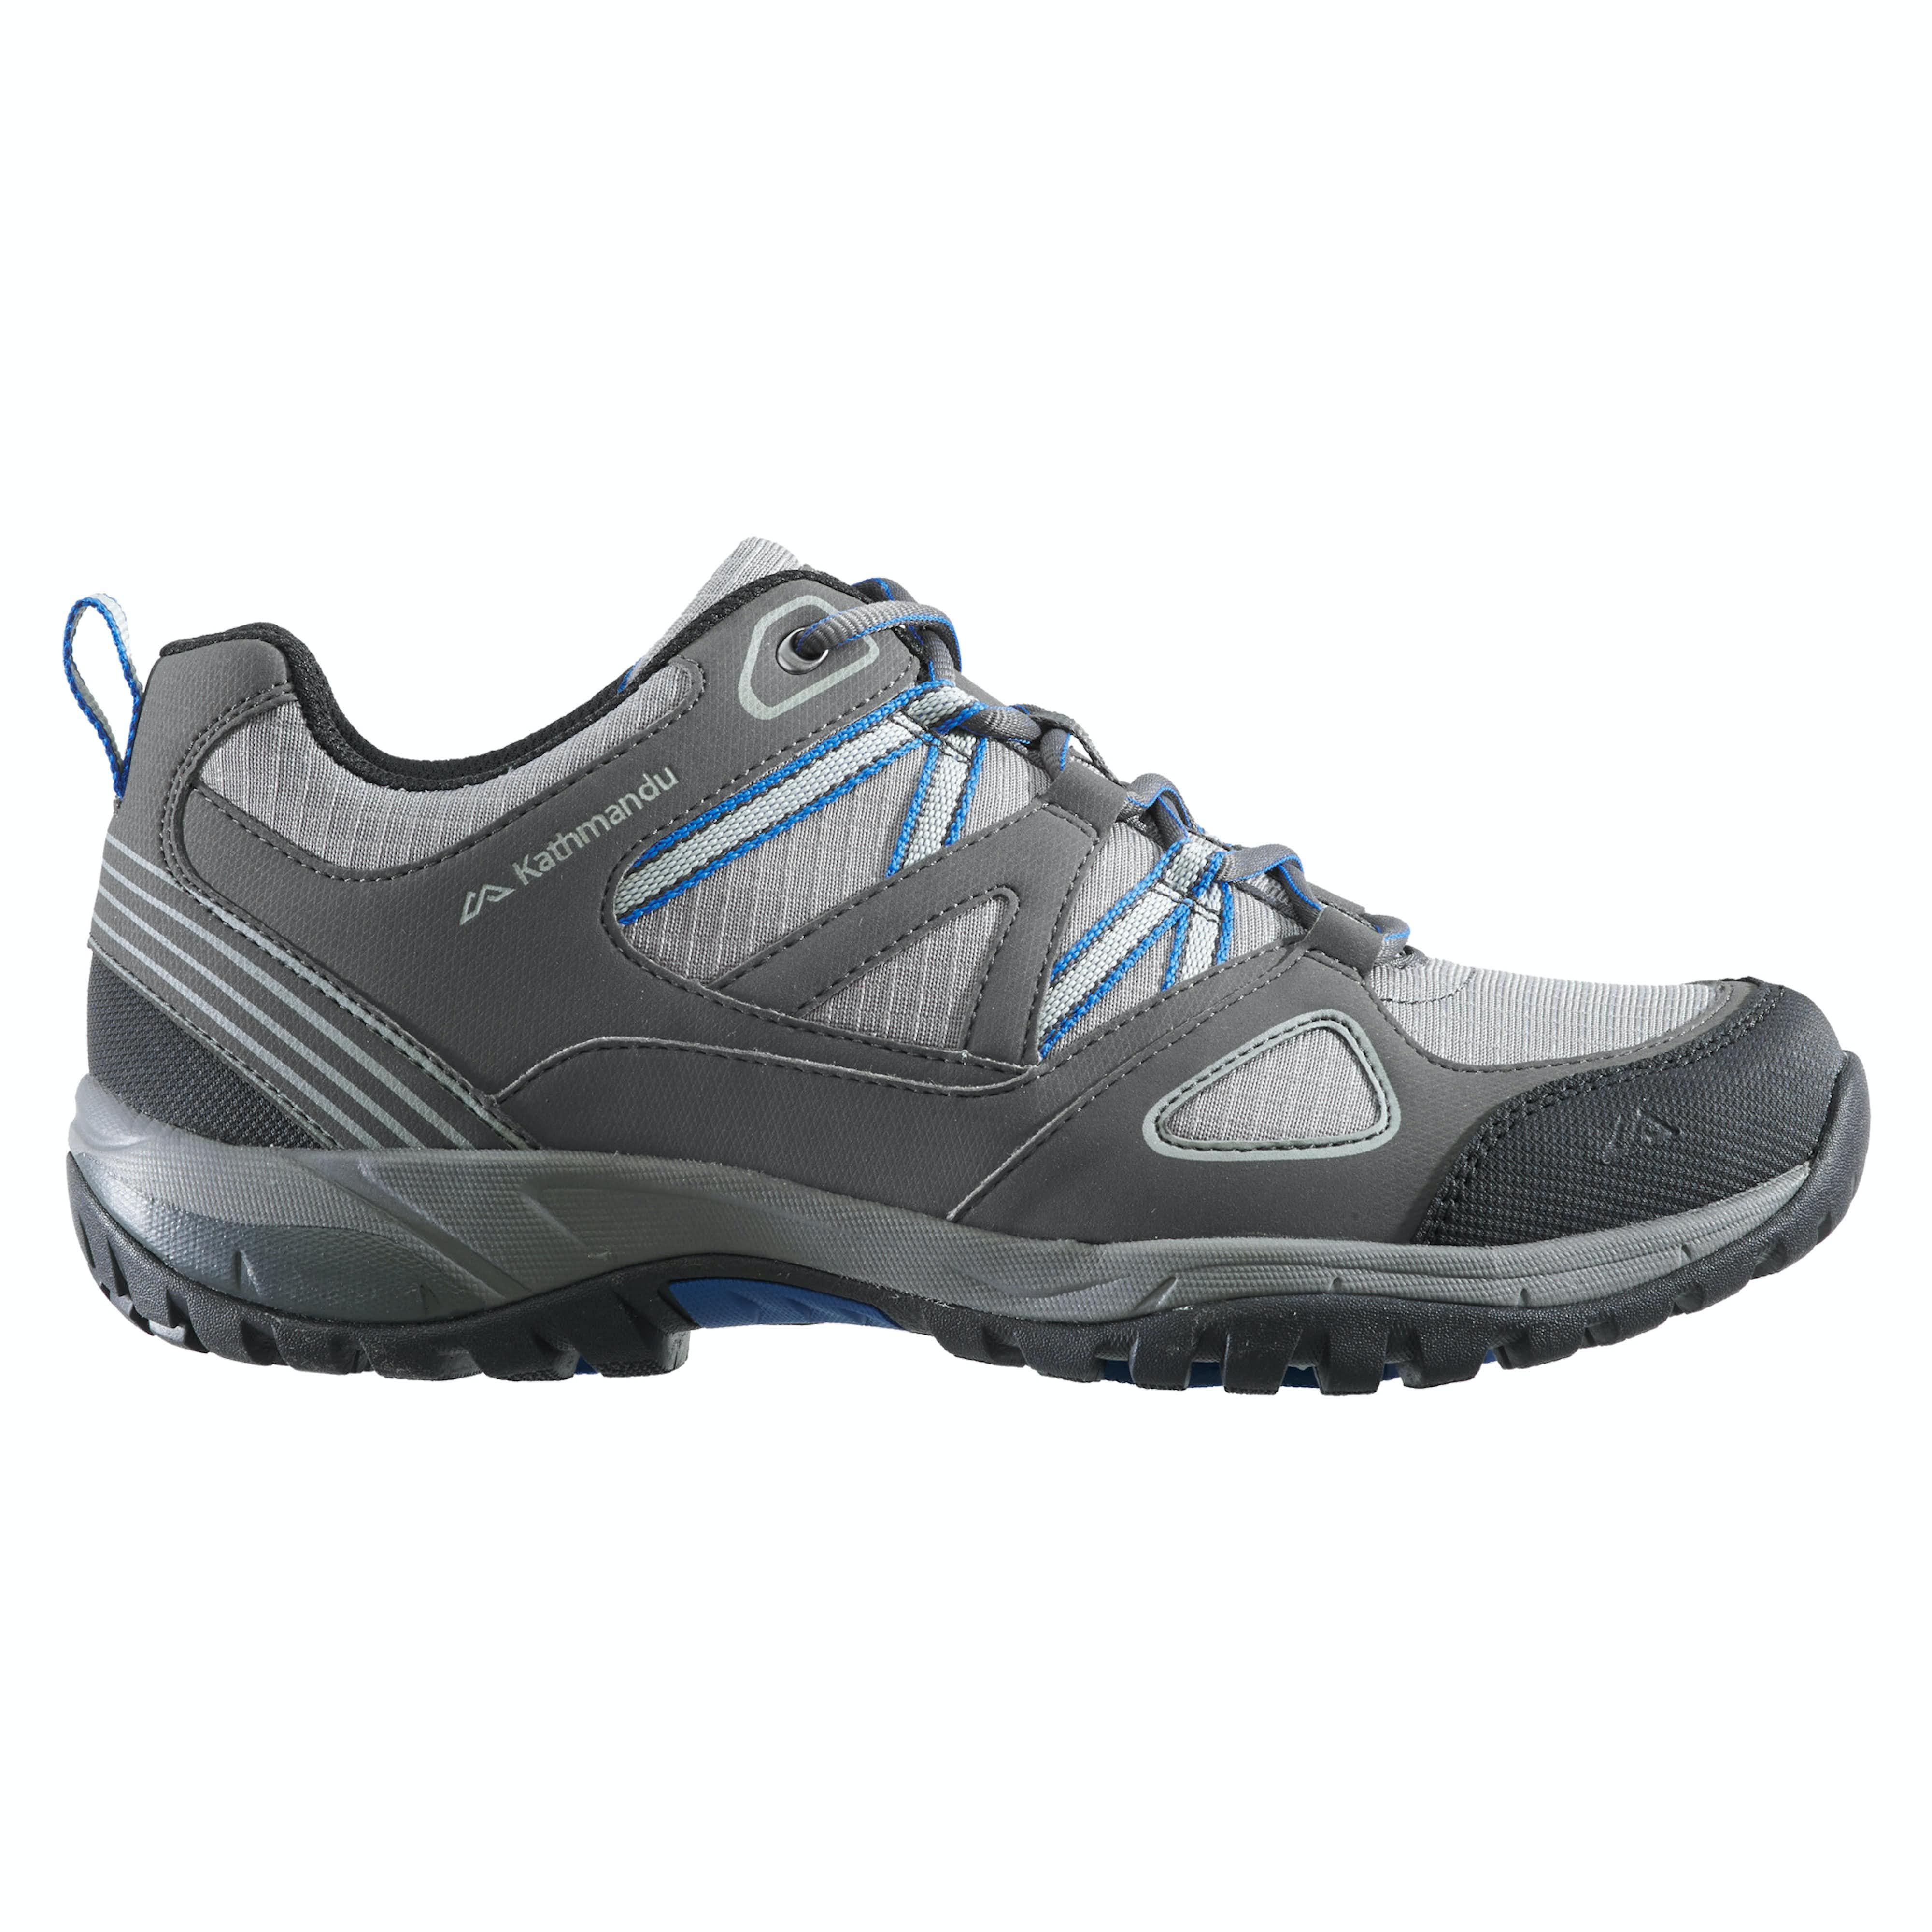 a4ca545bac1 Serpentine 2 Men s Shoes - Grey Firebrick